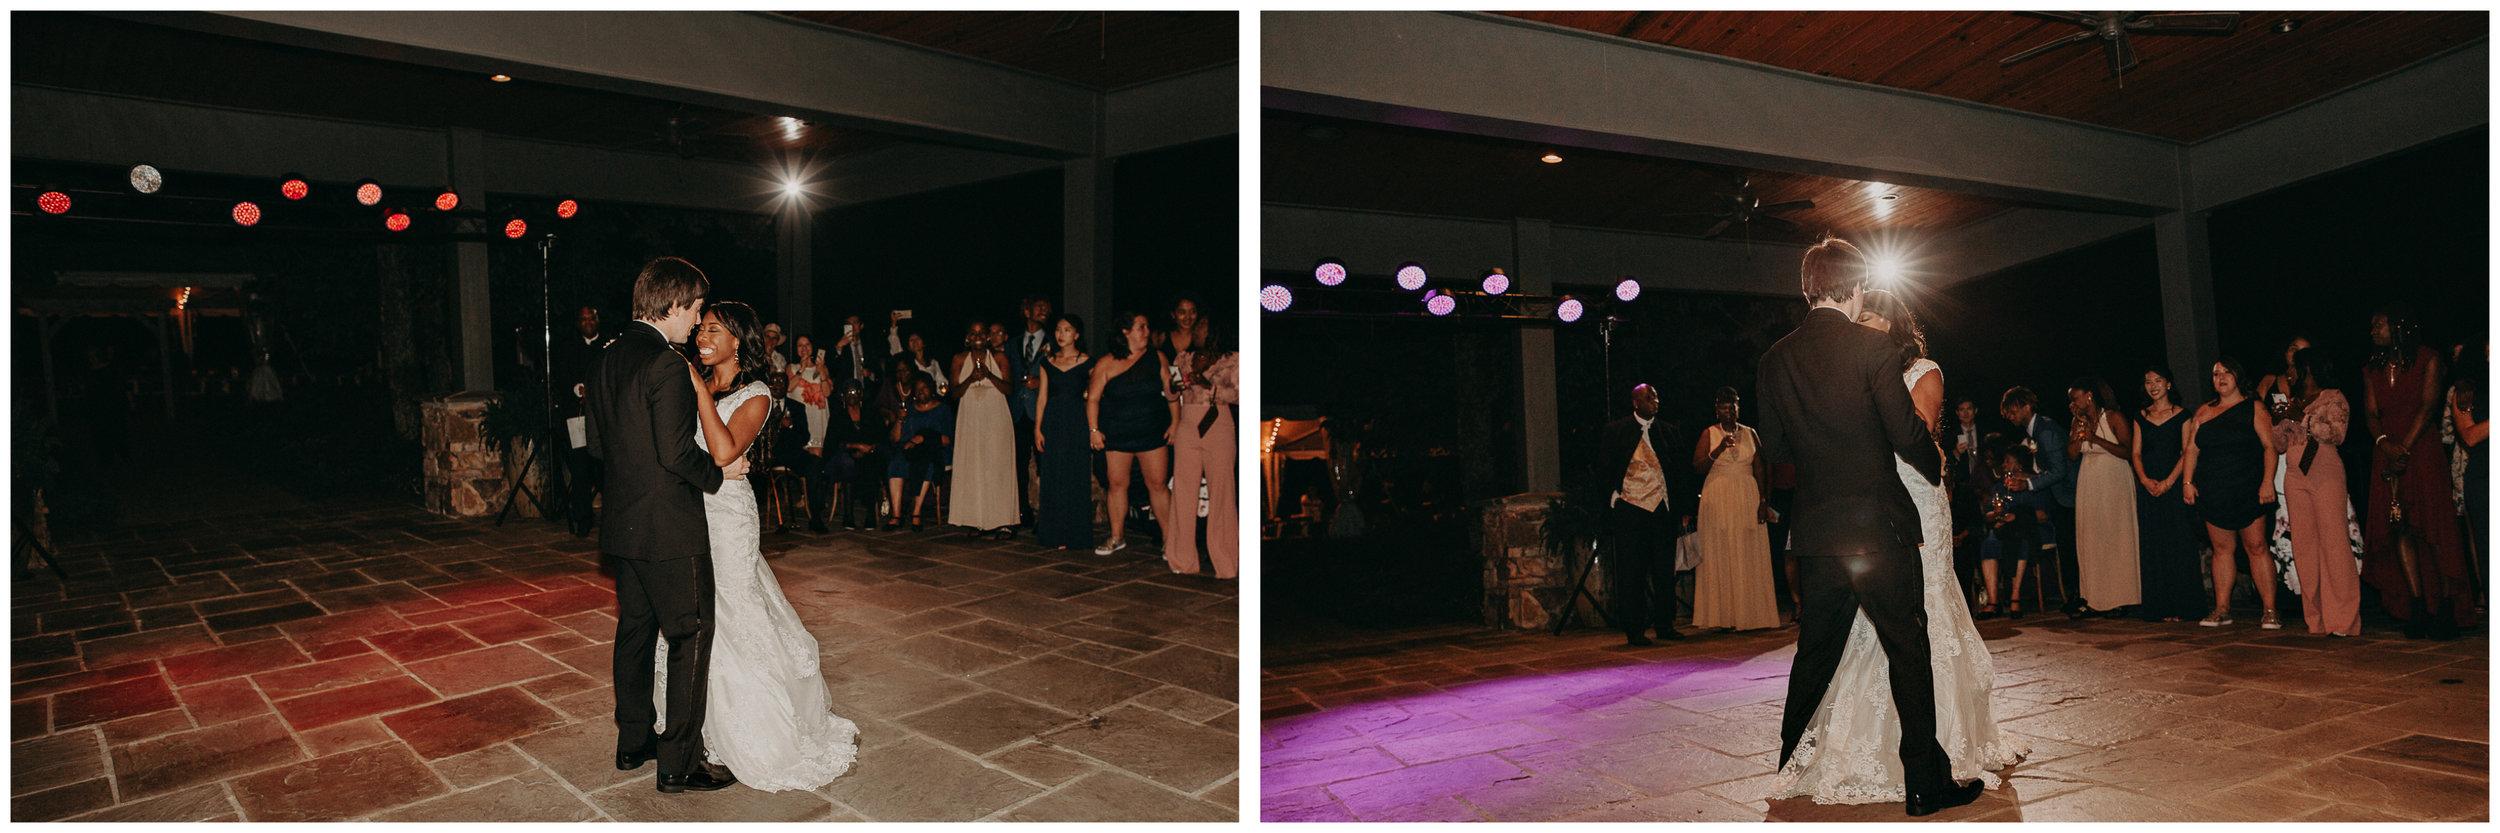 88- Kaya_vineyard_dahlonega_wedding_venue_detais_reception_aline_marin_photography.jpg